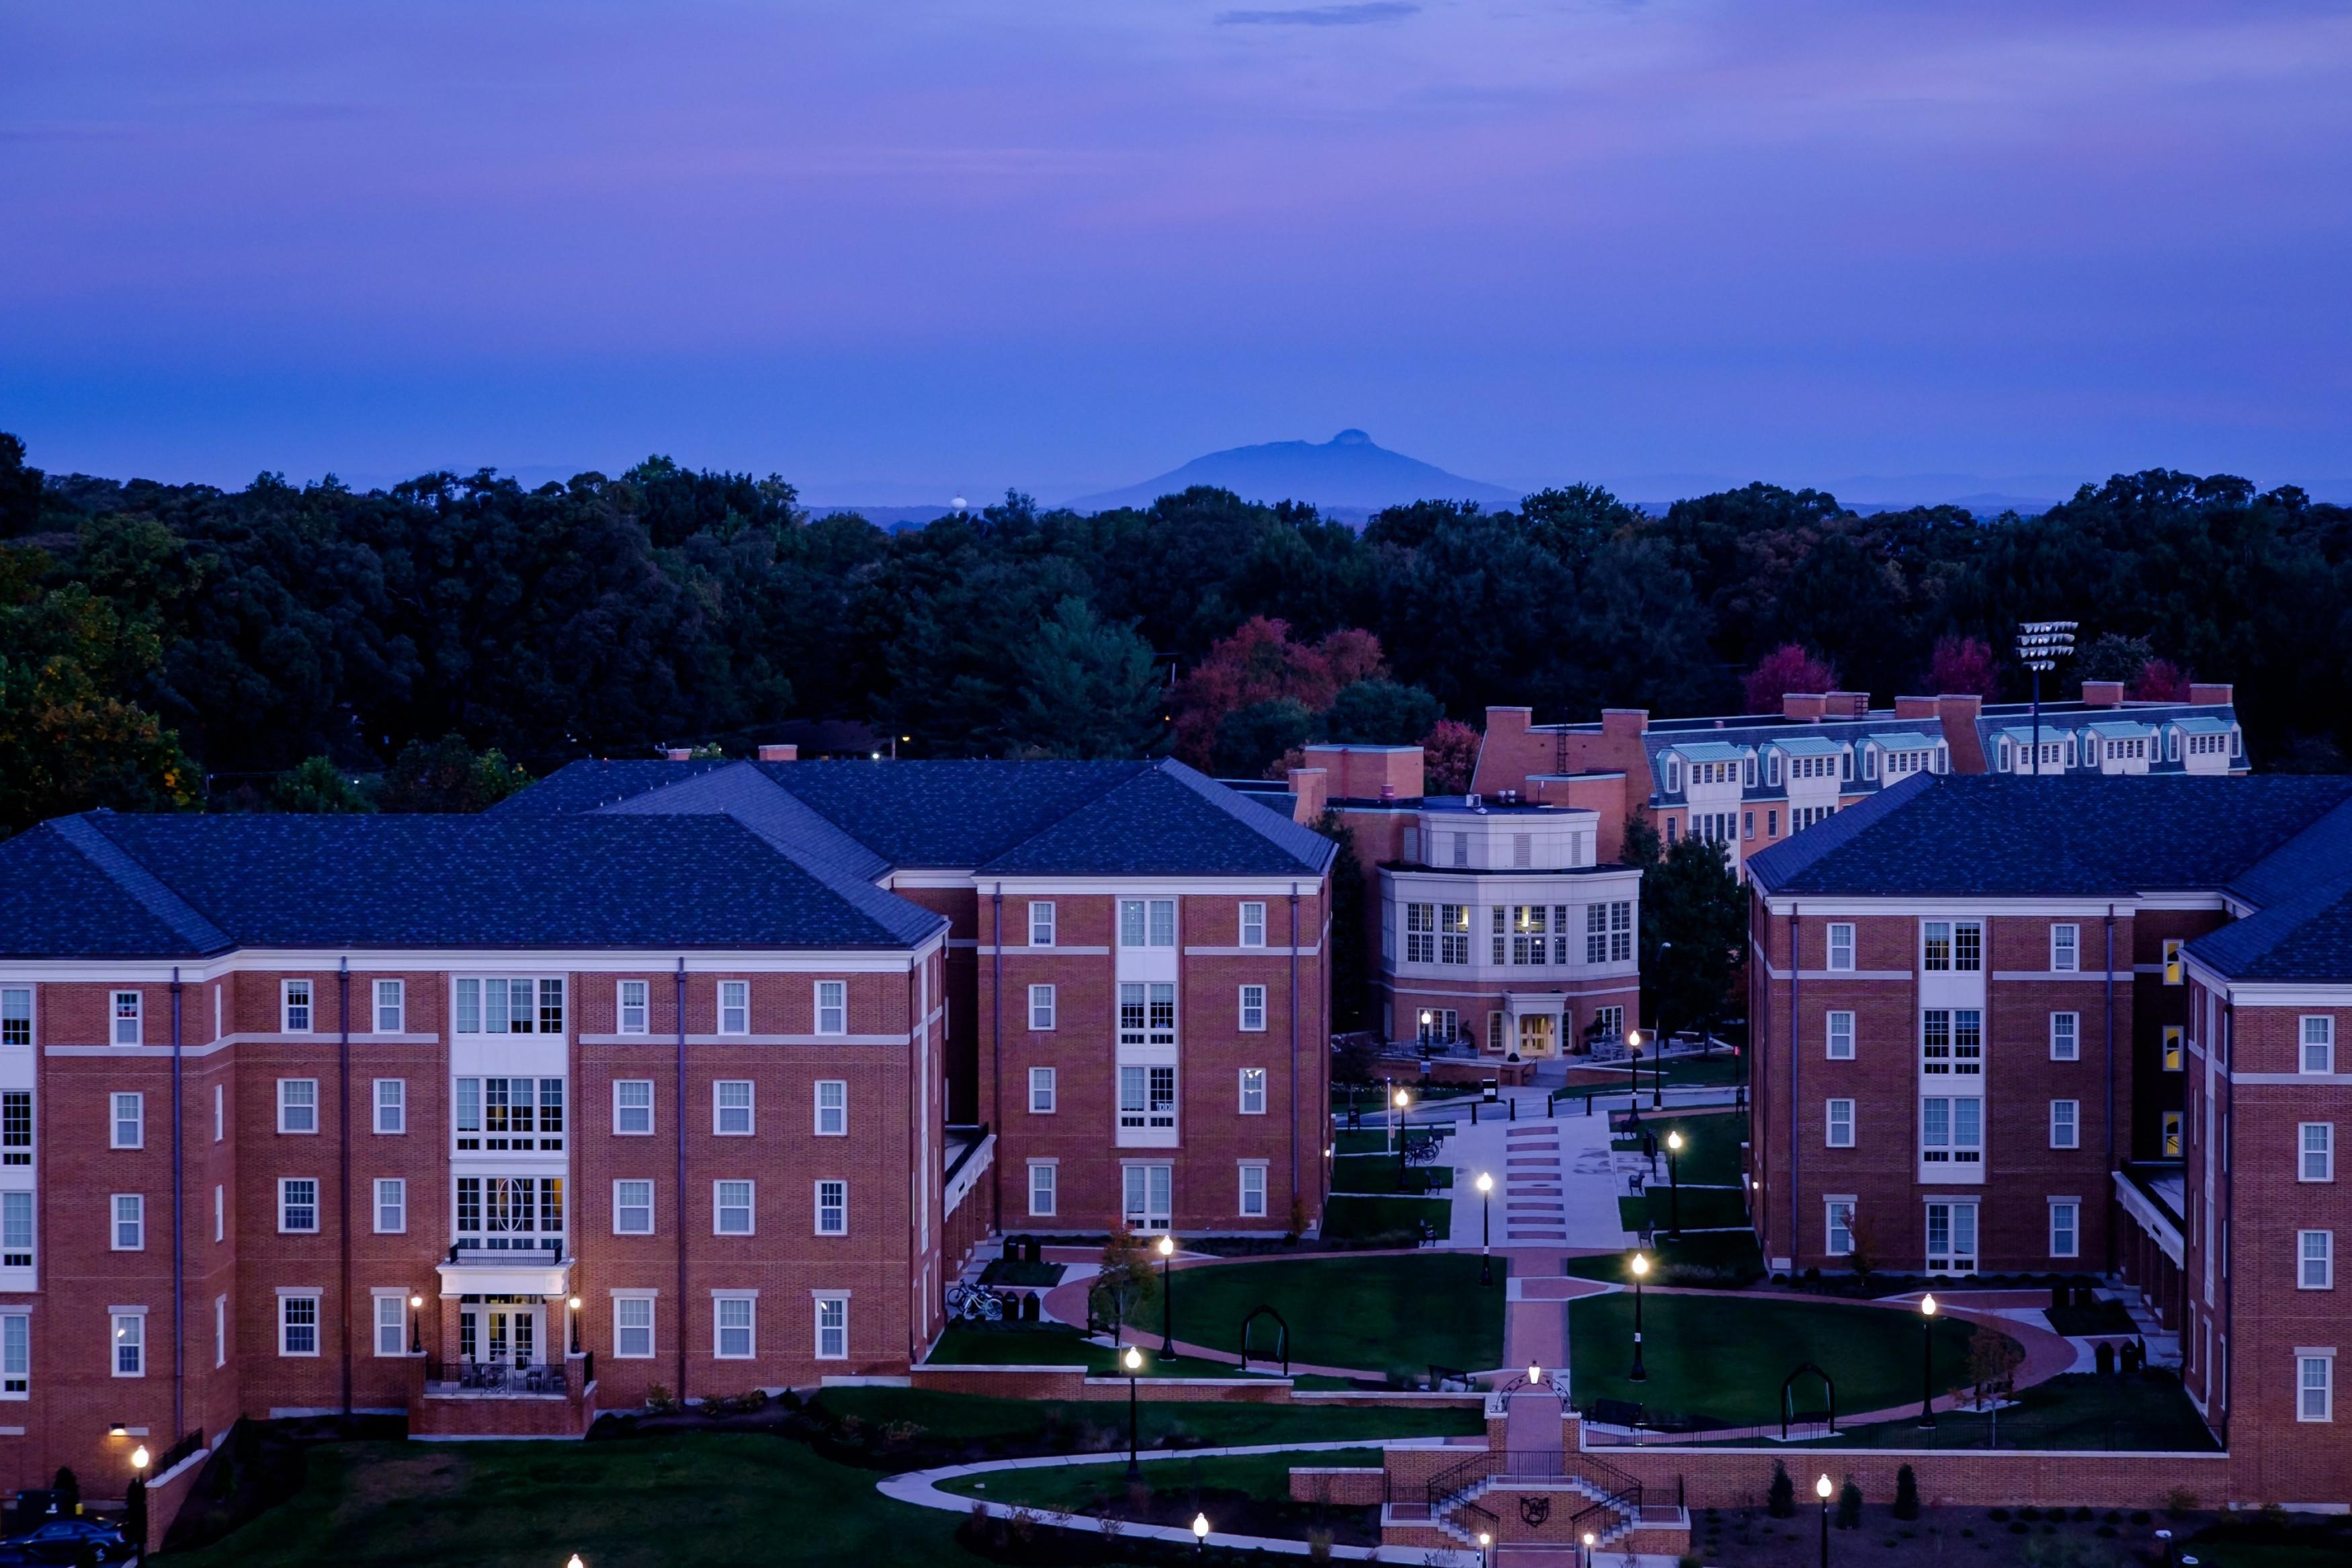 Dogwood (left) and Magnolia residence halls on the campus of Wake Forest University.